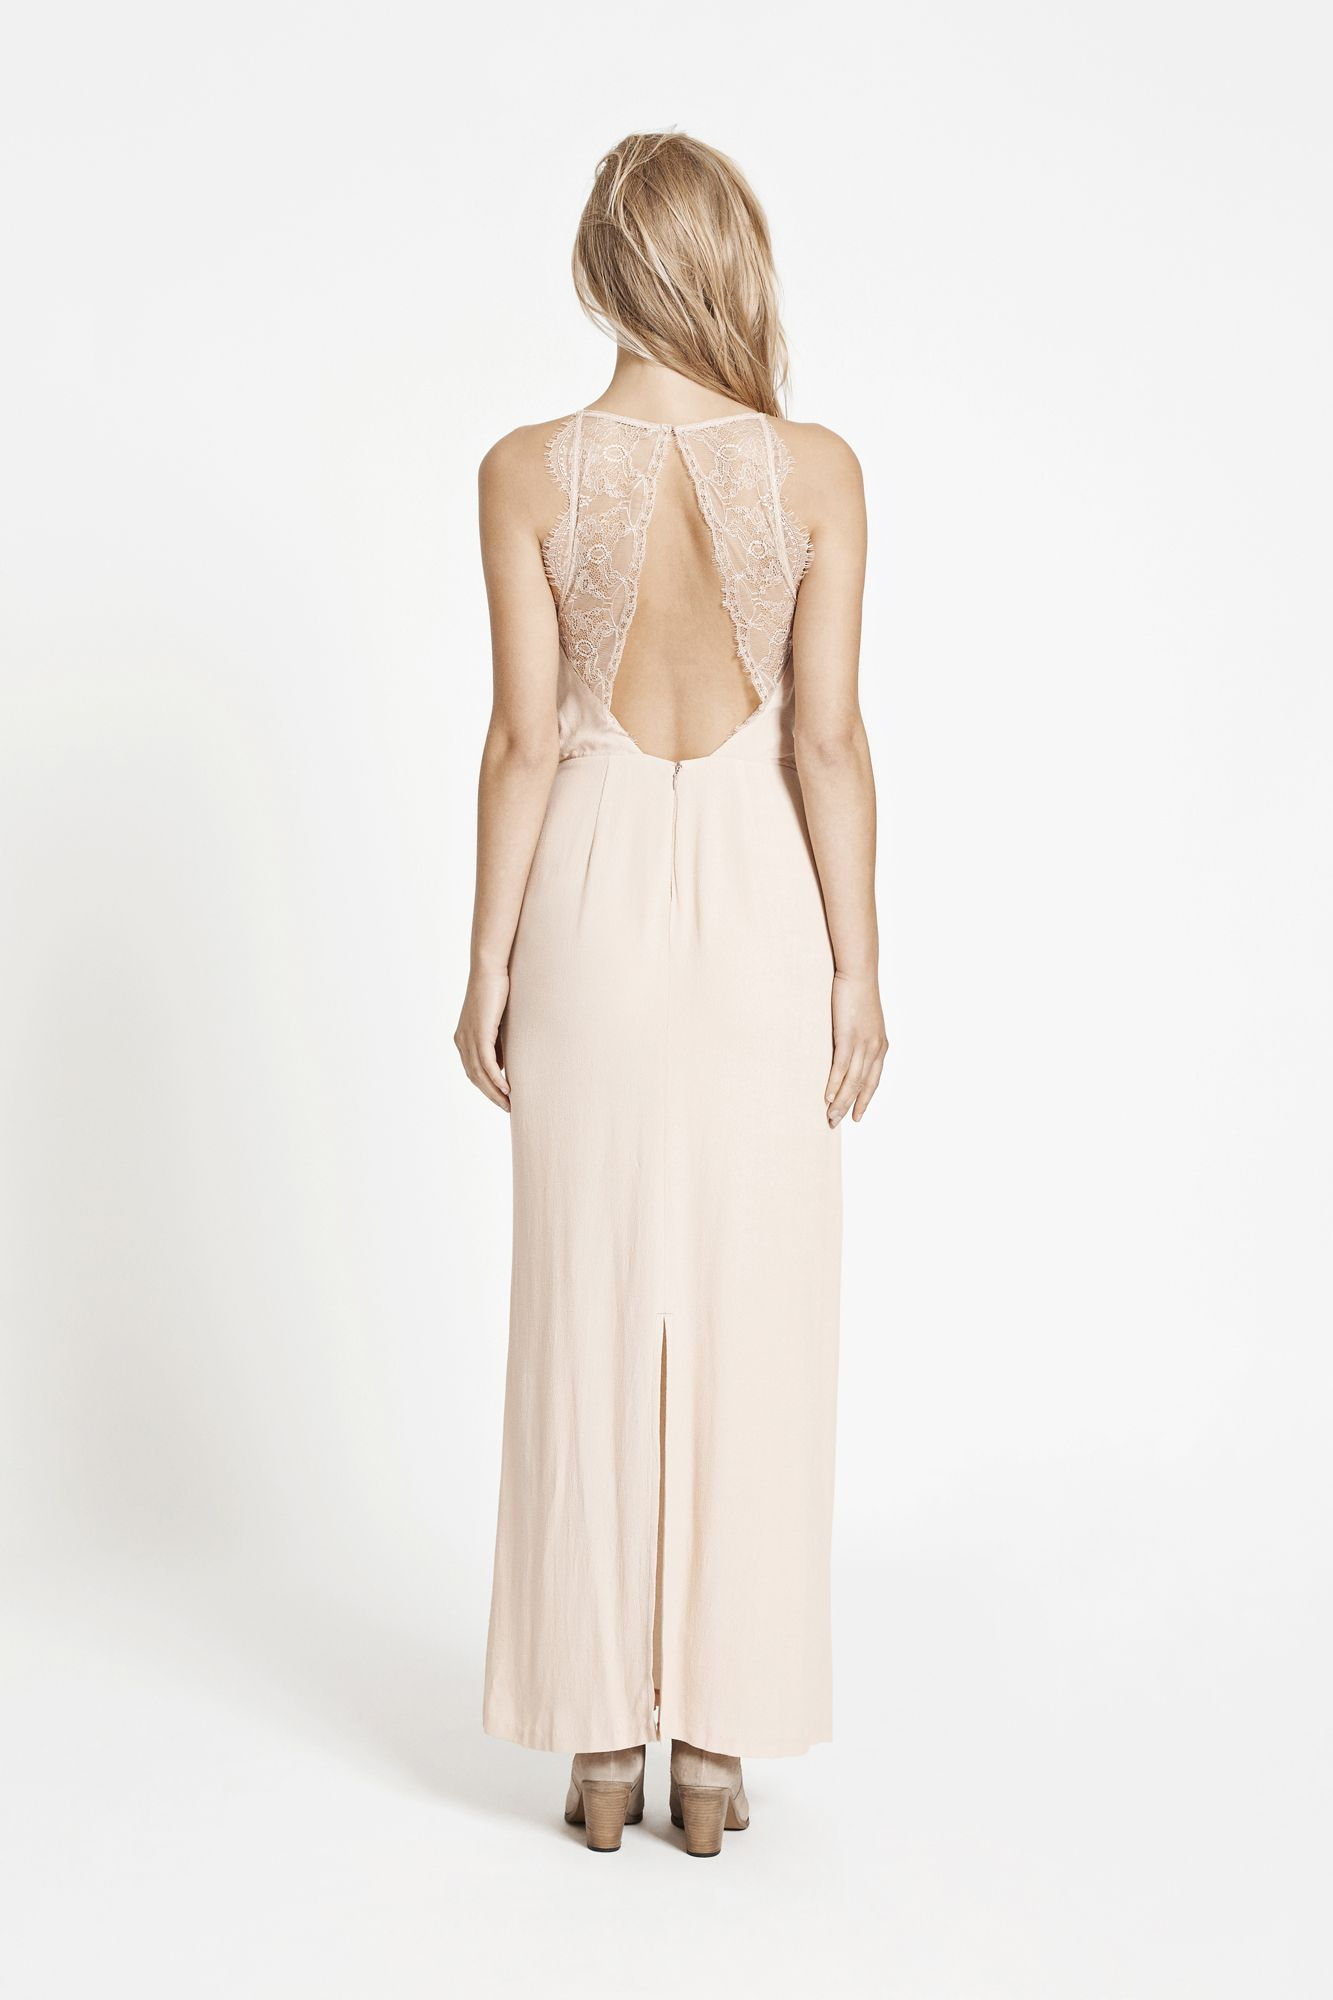 bfa94dc3f357 Willow dress long 5687